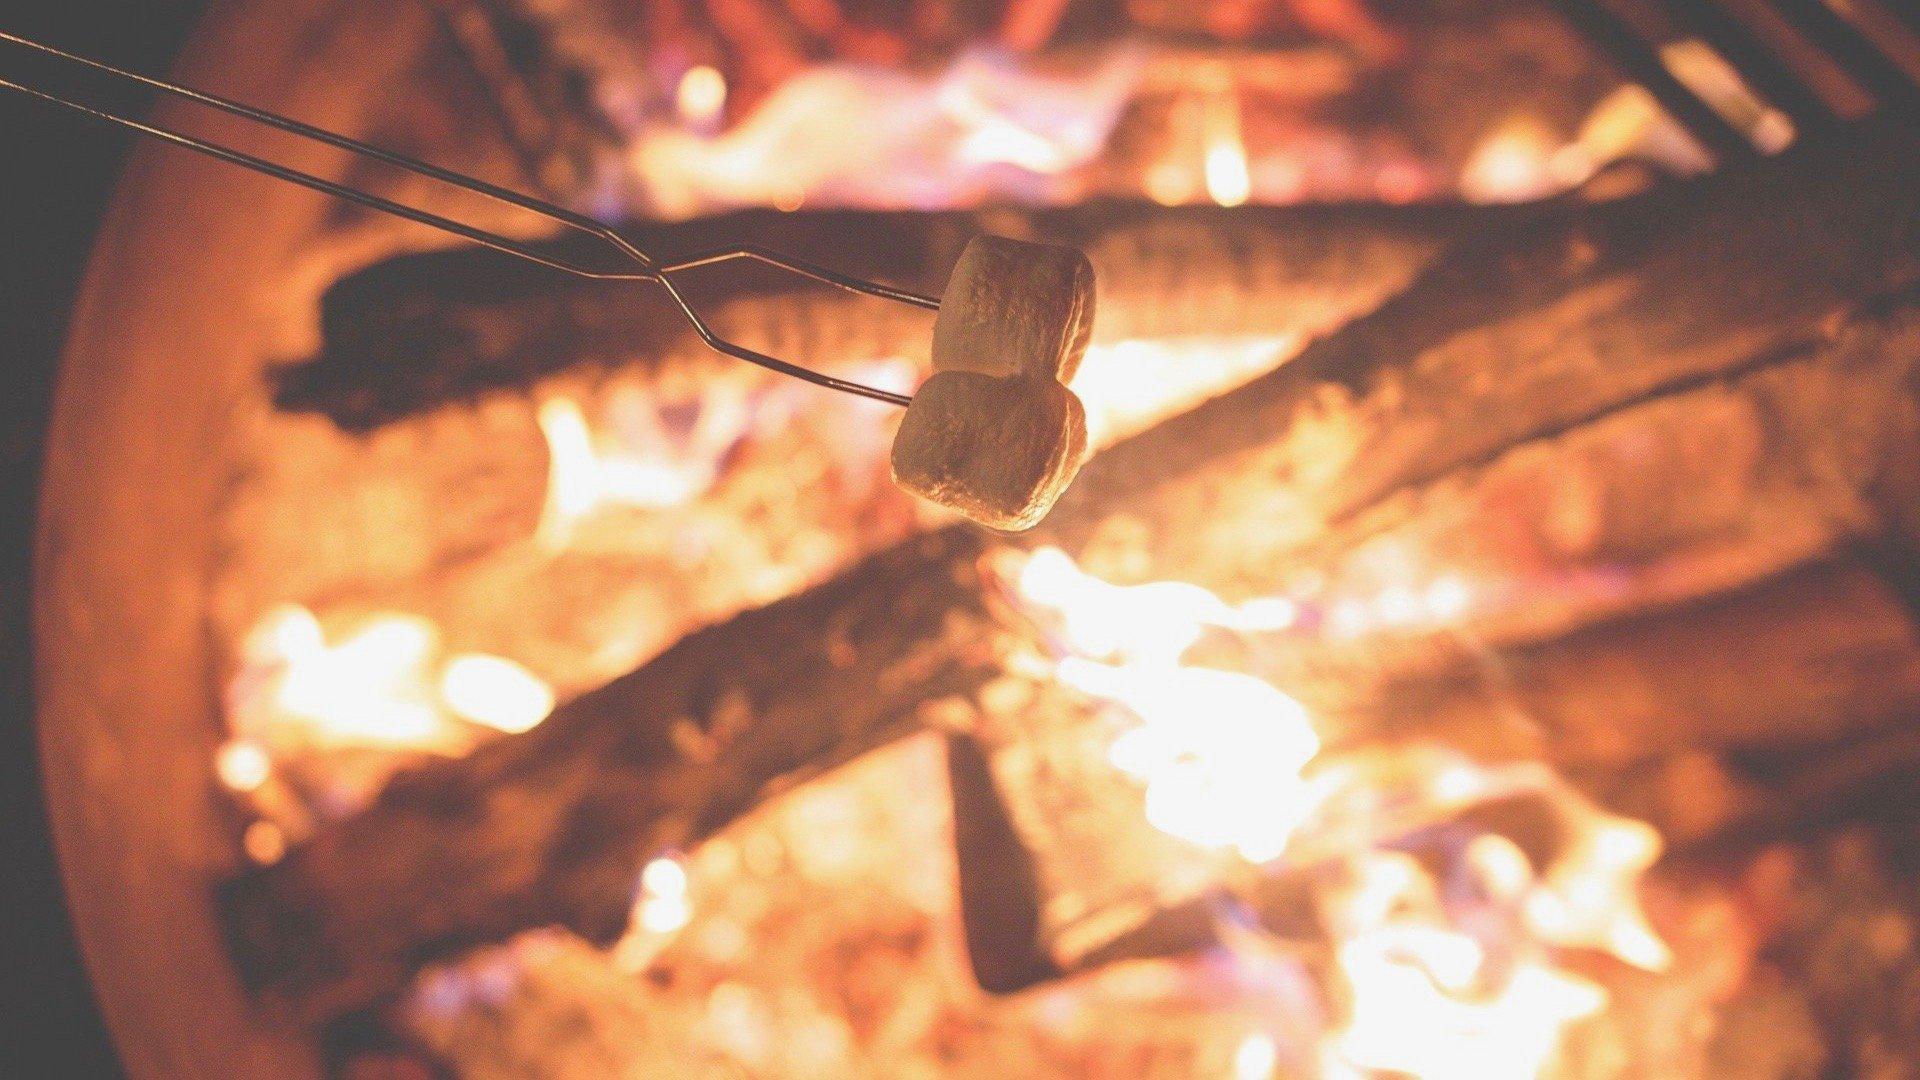 campfire-1031141_1920 2